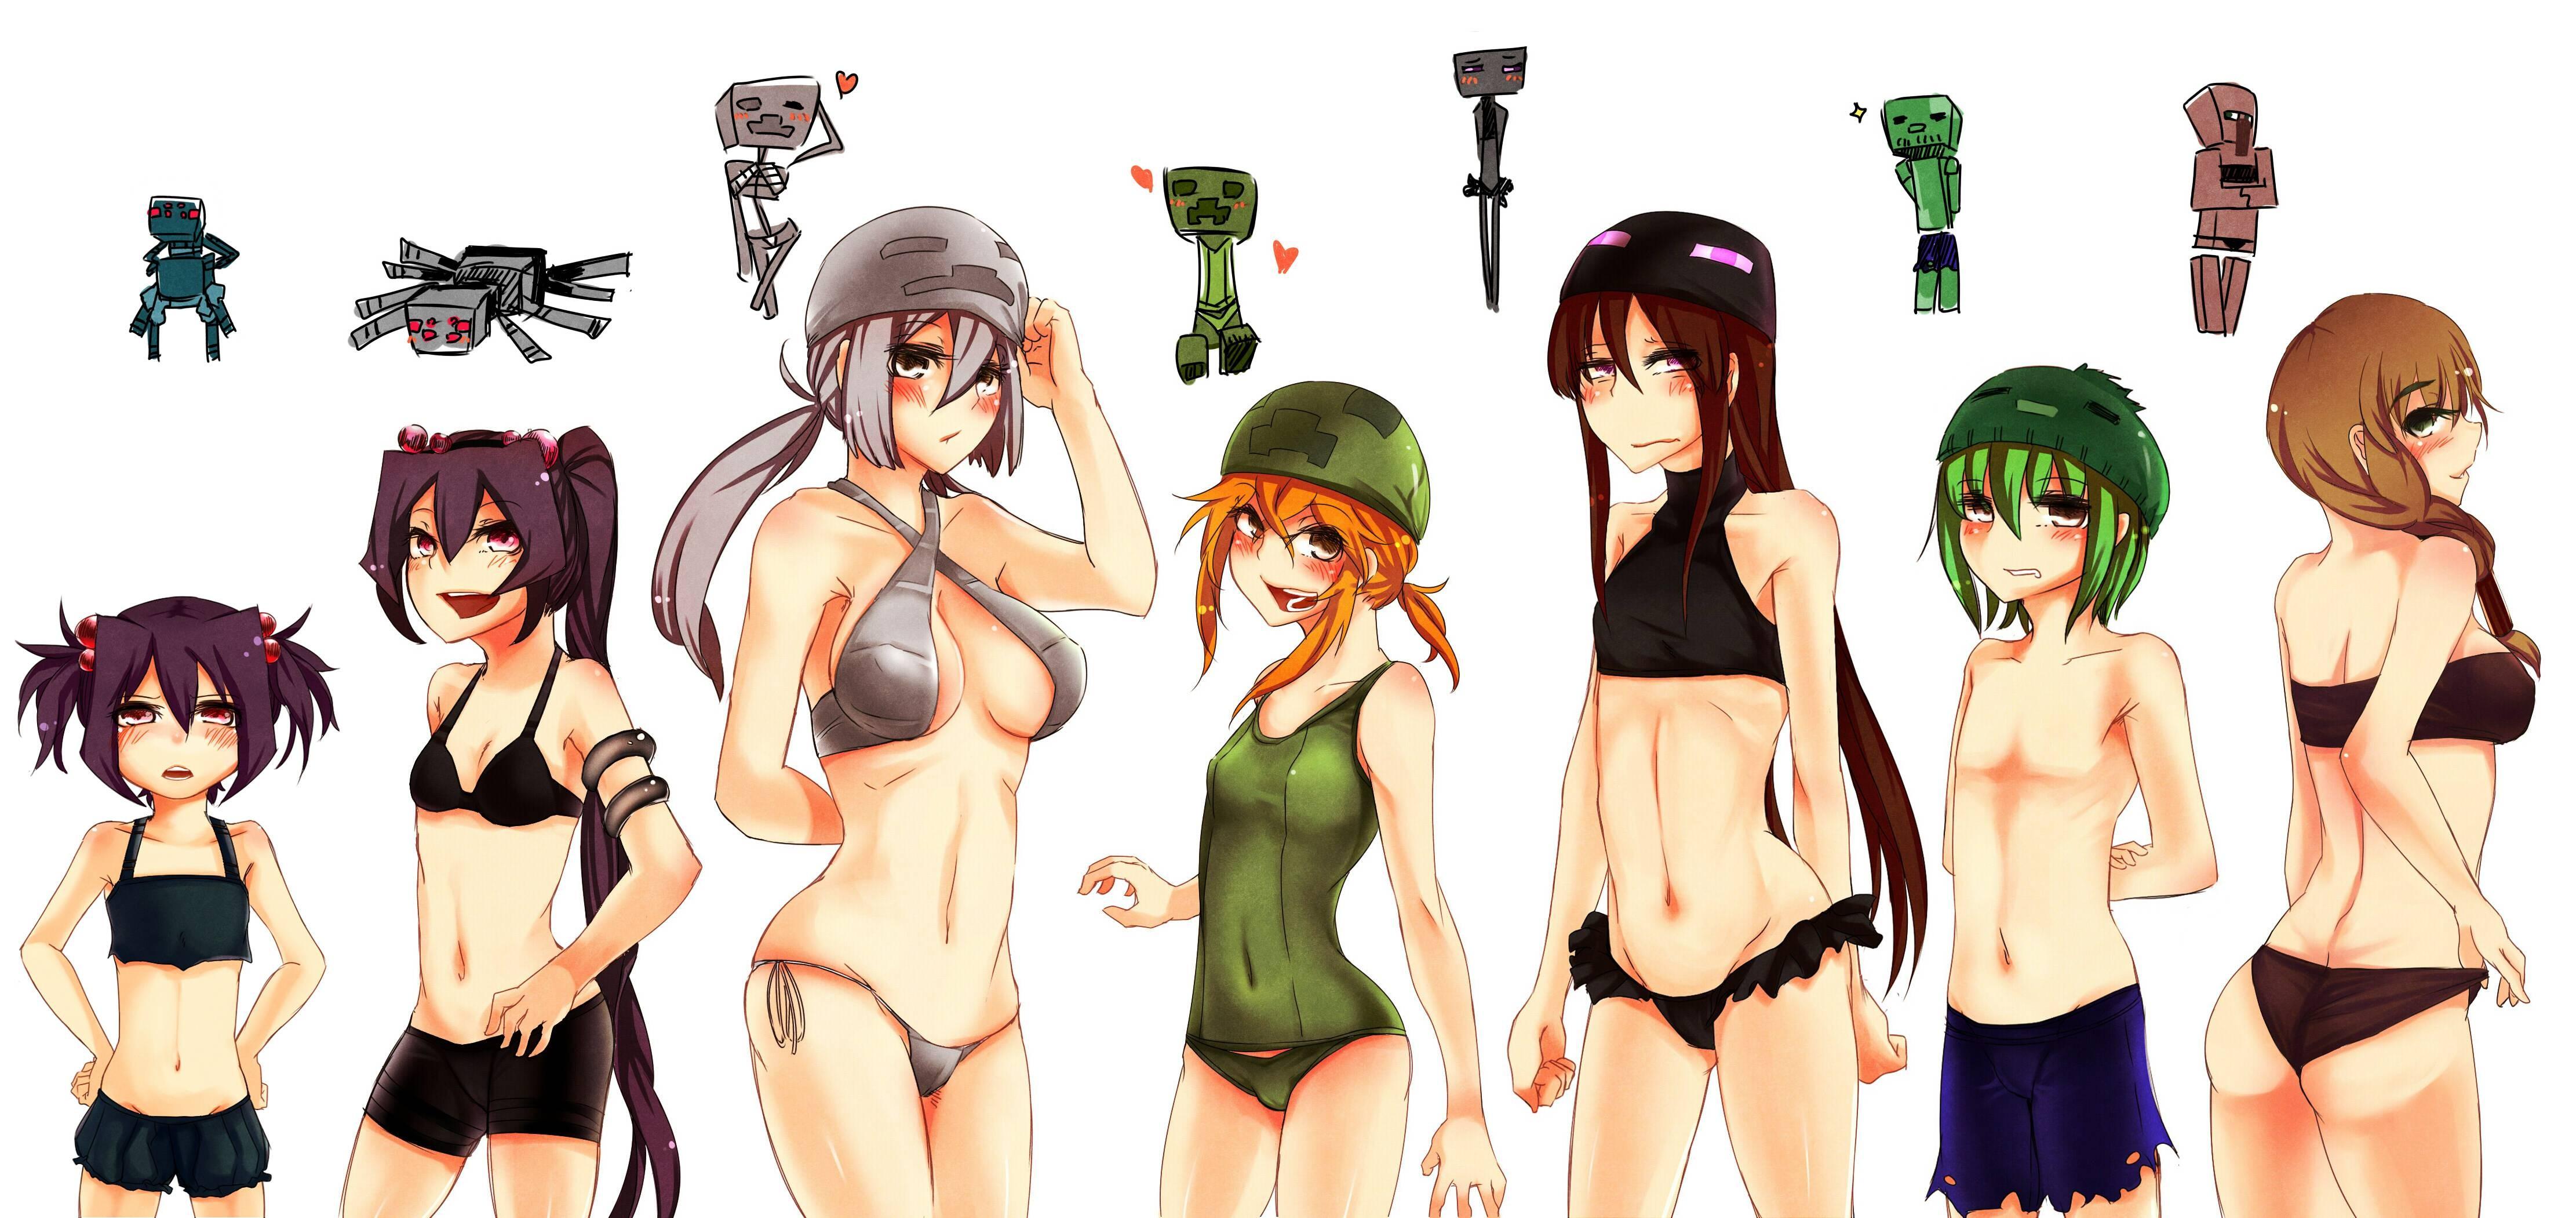 Майнкрафт голые девушки